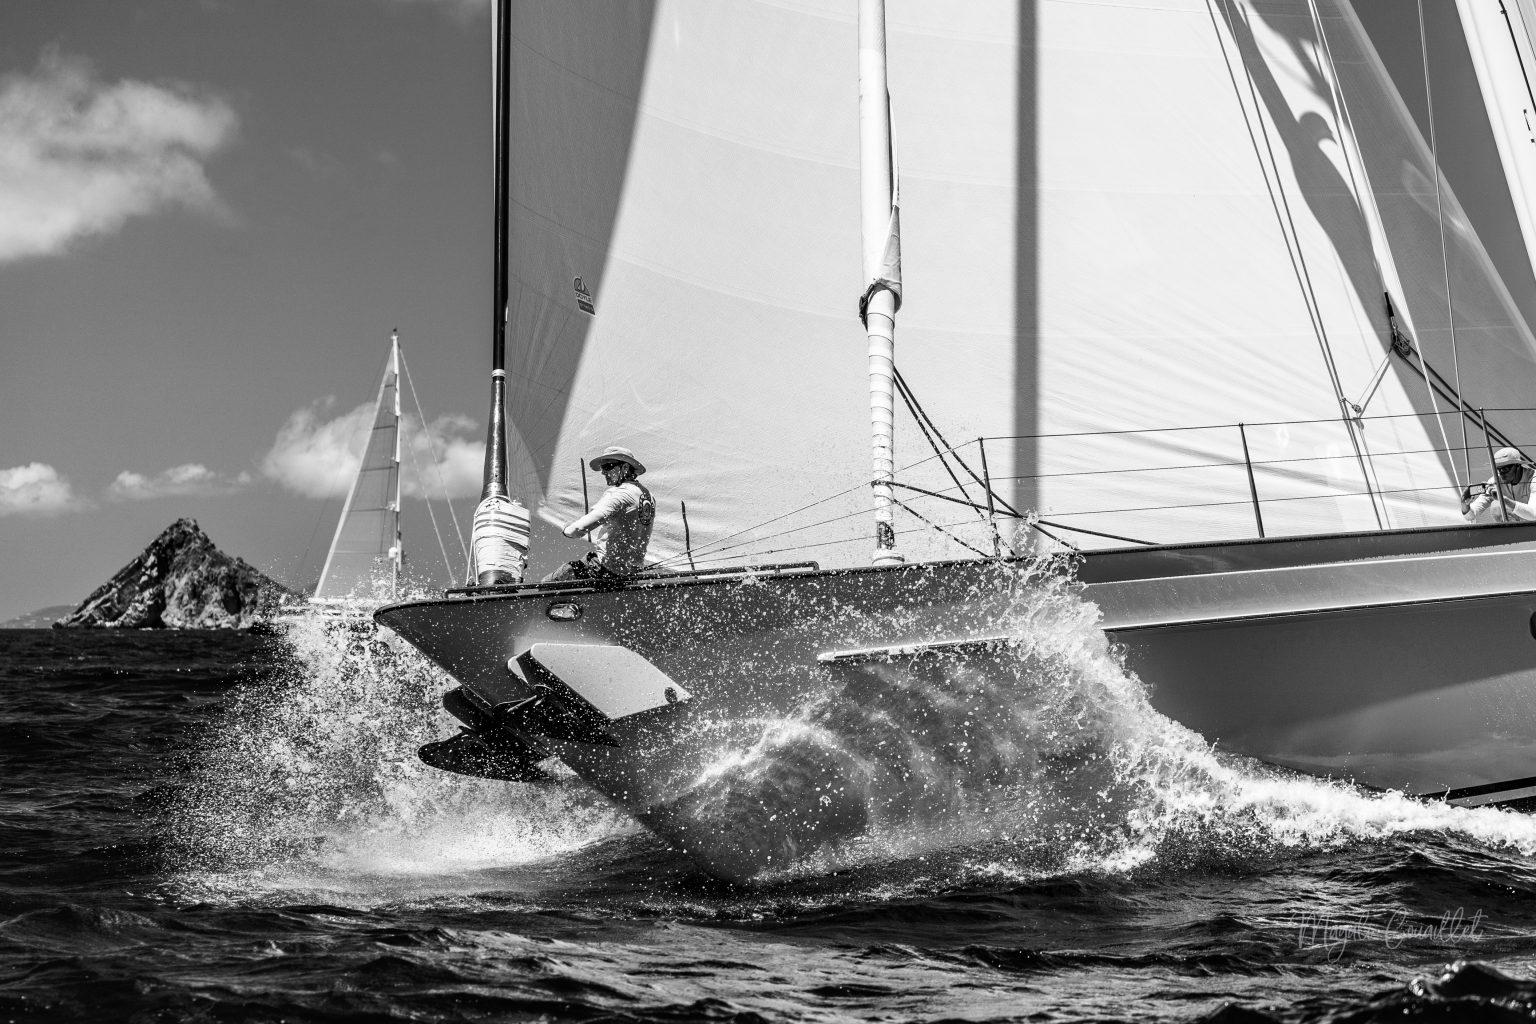 Sail yacht, Bucket Regatta 2019 St Barths-2